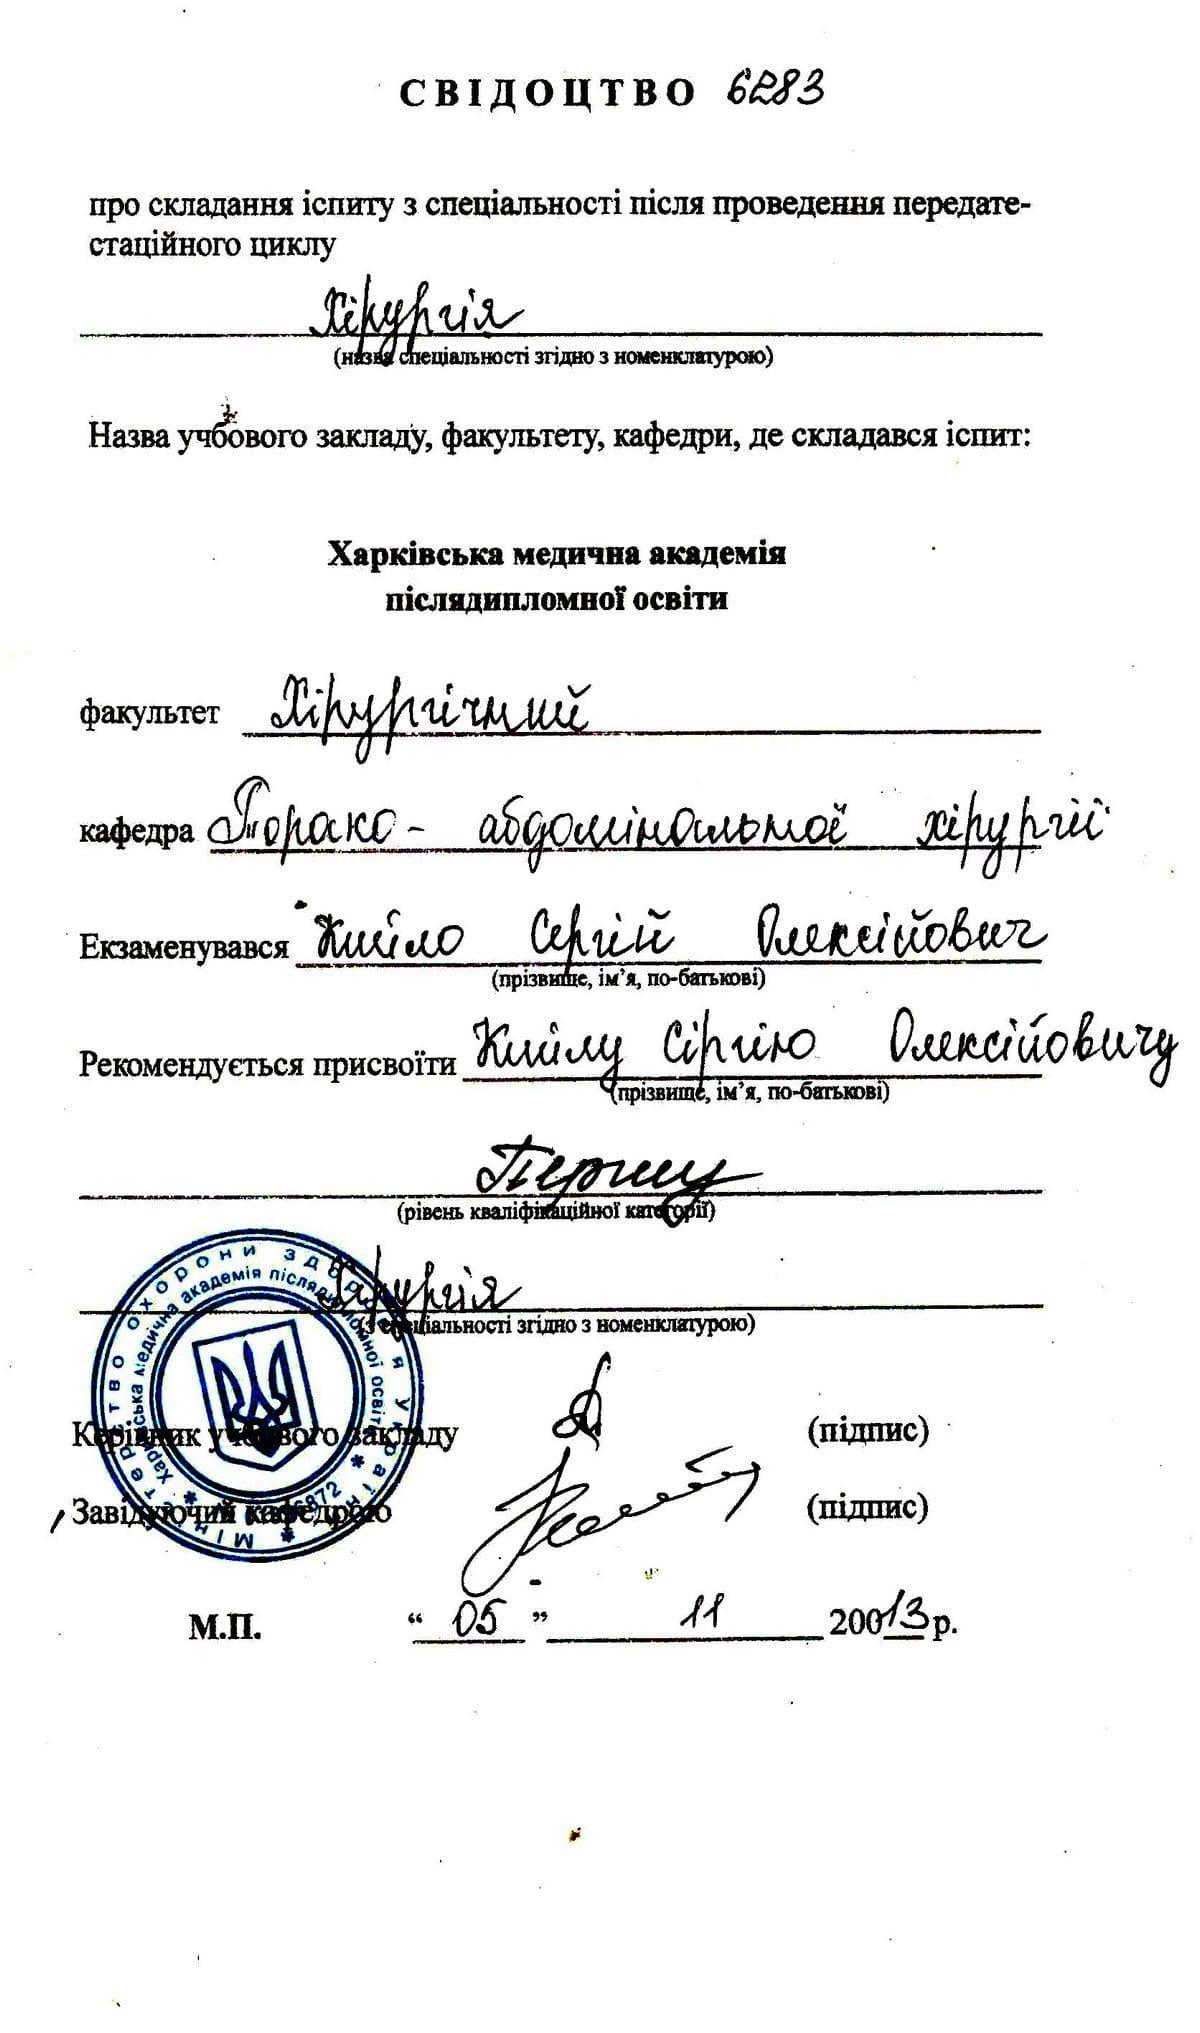 Документ №:16 Сертификат пластического хирурга Кийло Сергея Алексеевича